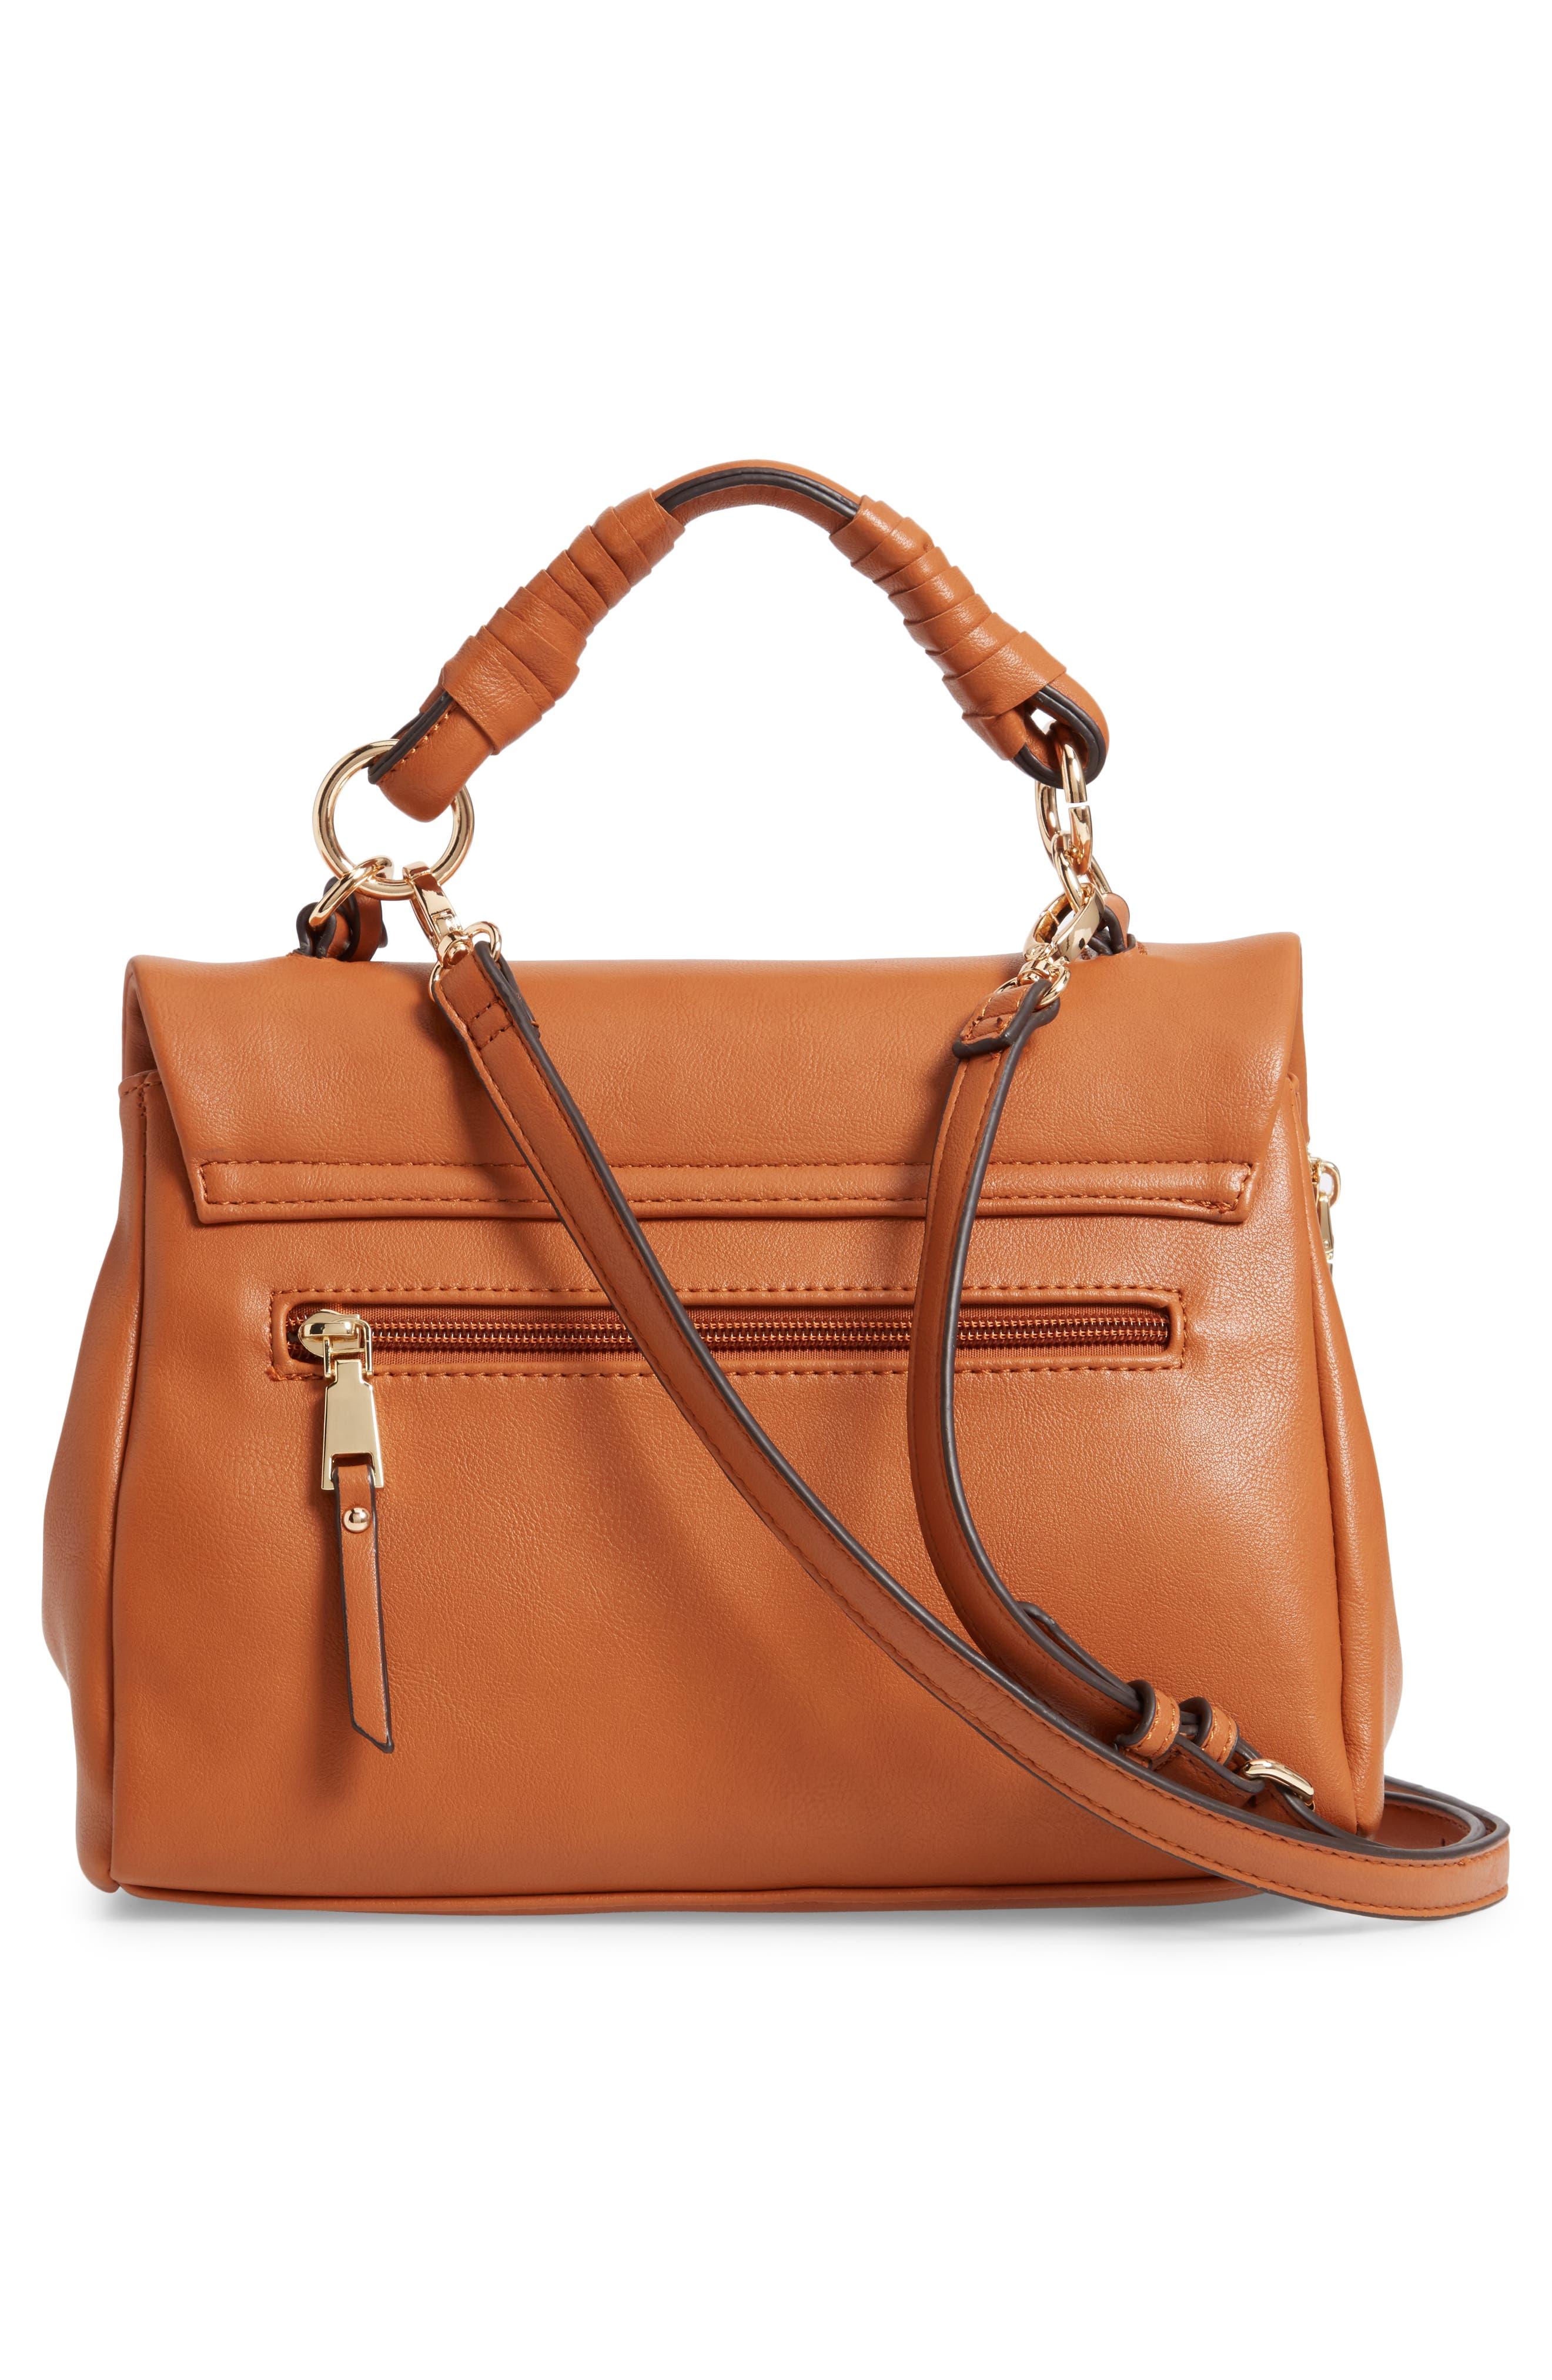 SOLE SOCIETY, Rubie Faux Leather Crossbody Bag, Alternate thumbnail 4, color, COGNAC